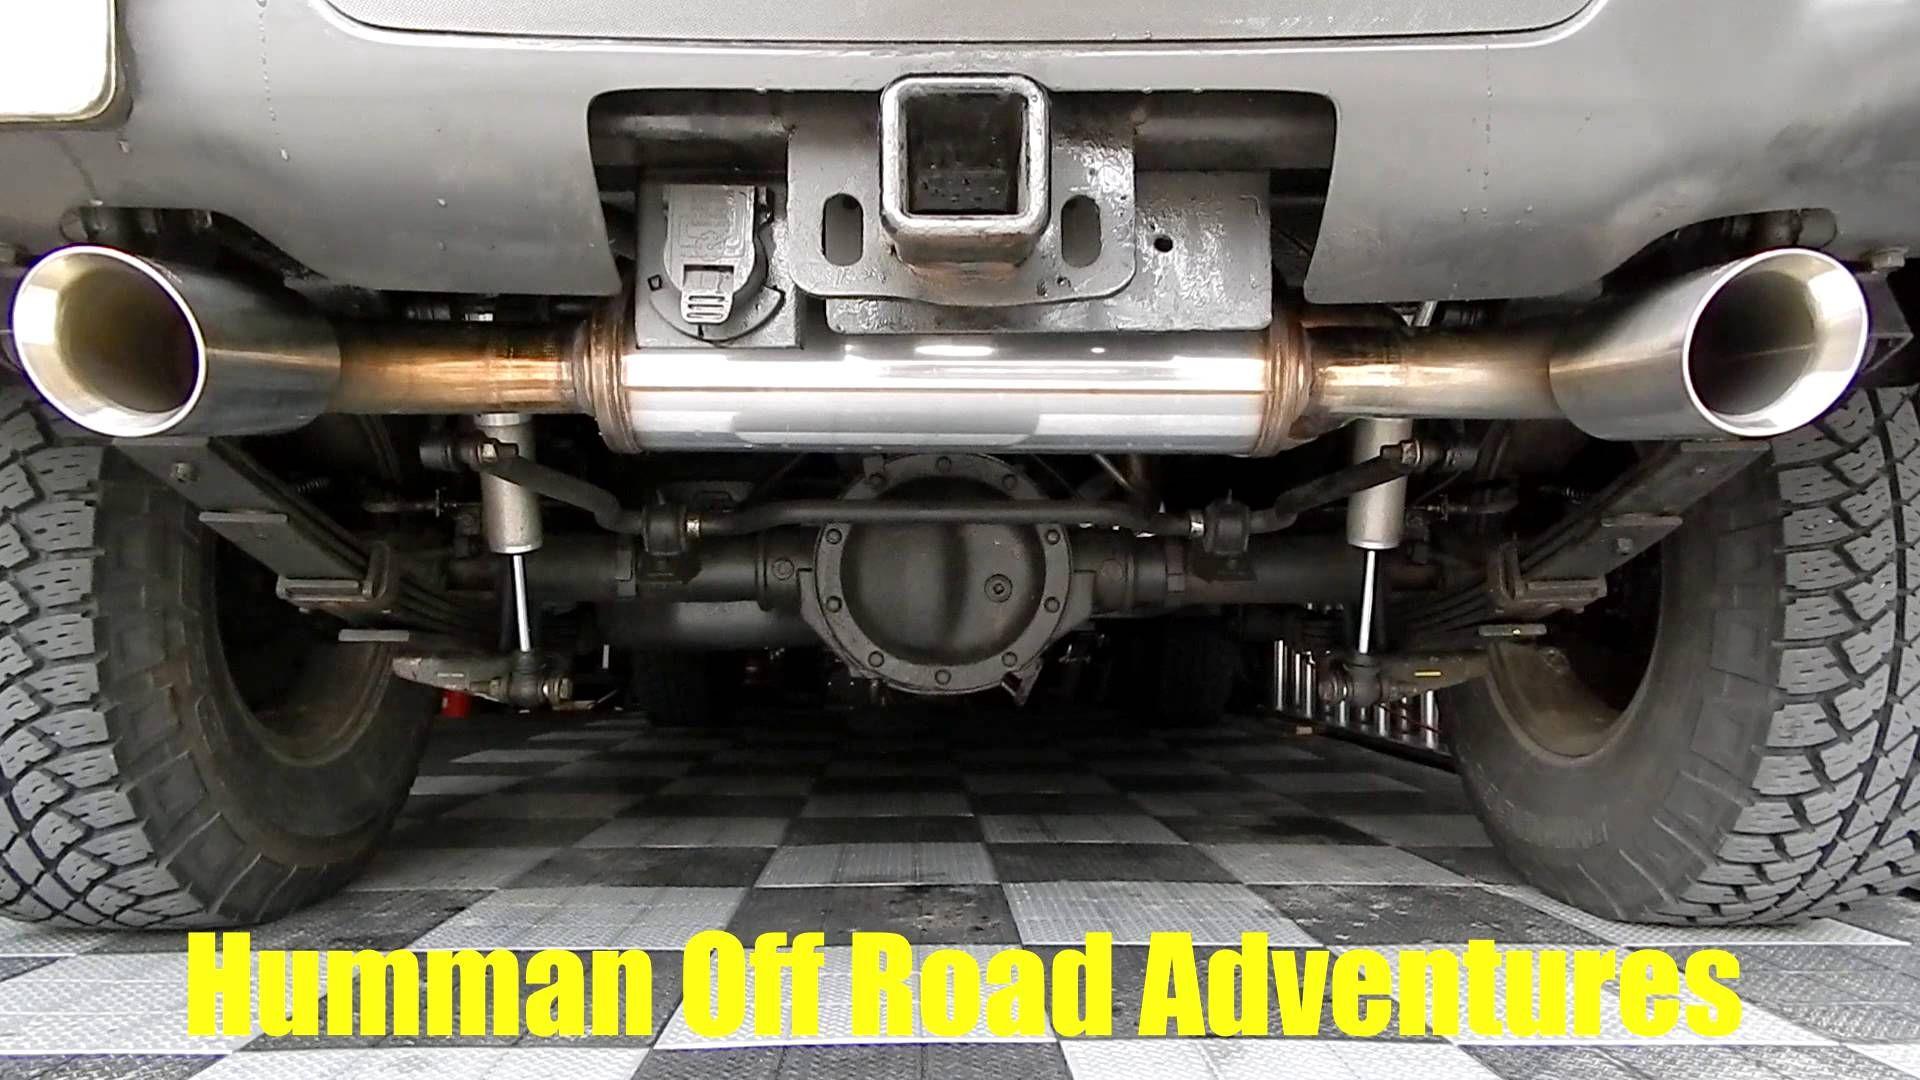 MAGNAFLOW Performance Exhaust System Sound on Hummer H3 Adventure